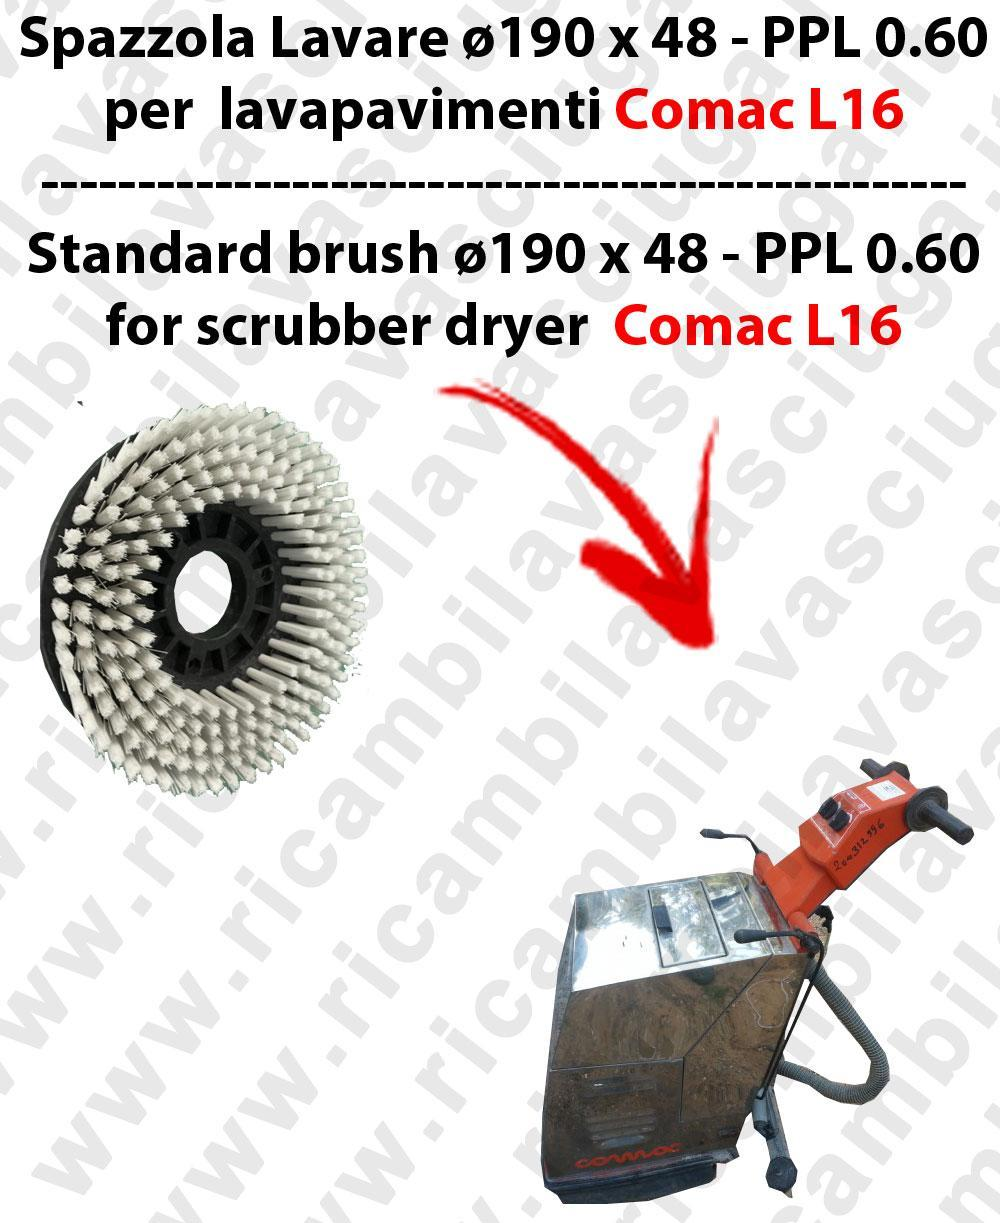 STANDARD BRUSH  for scrubber dryer COMAC model L16  ⌀ 190 x 48 - PPL 0.6